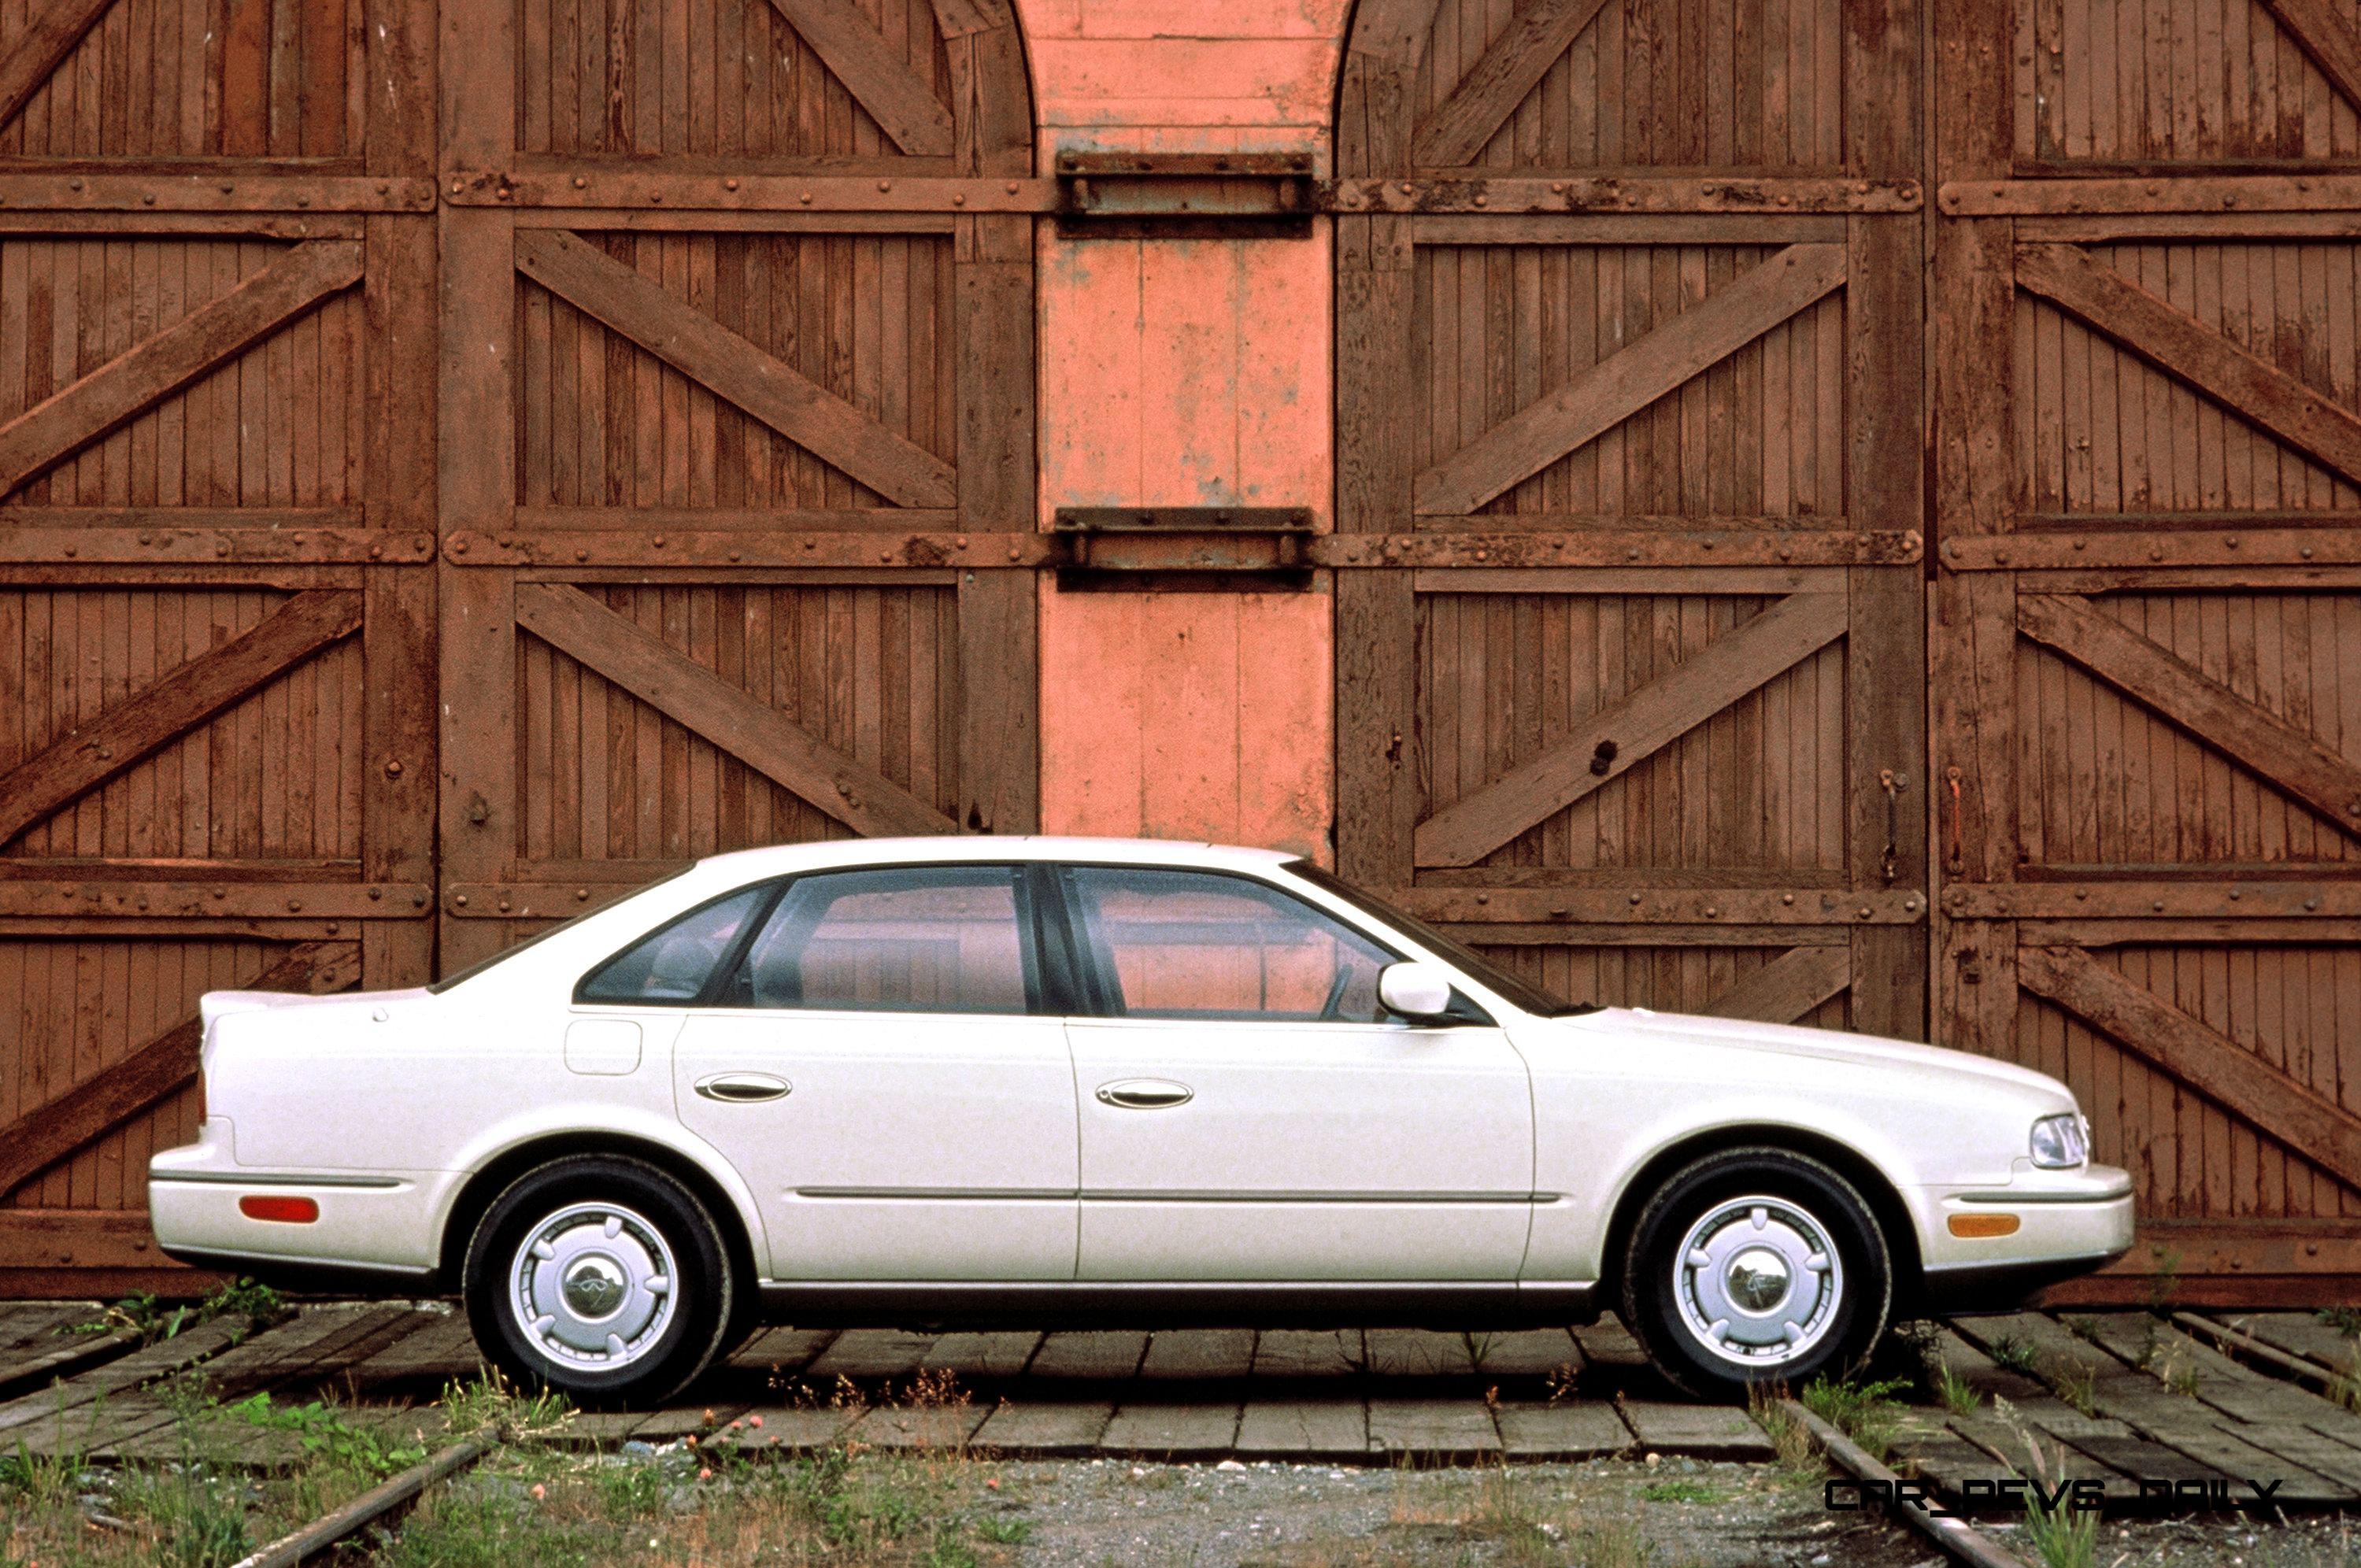 Bmw Two Door >> Concept Flashback - 1985 Nissan Cue-X Inspired Original